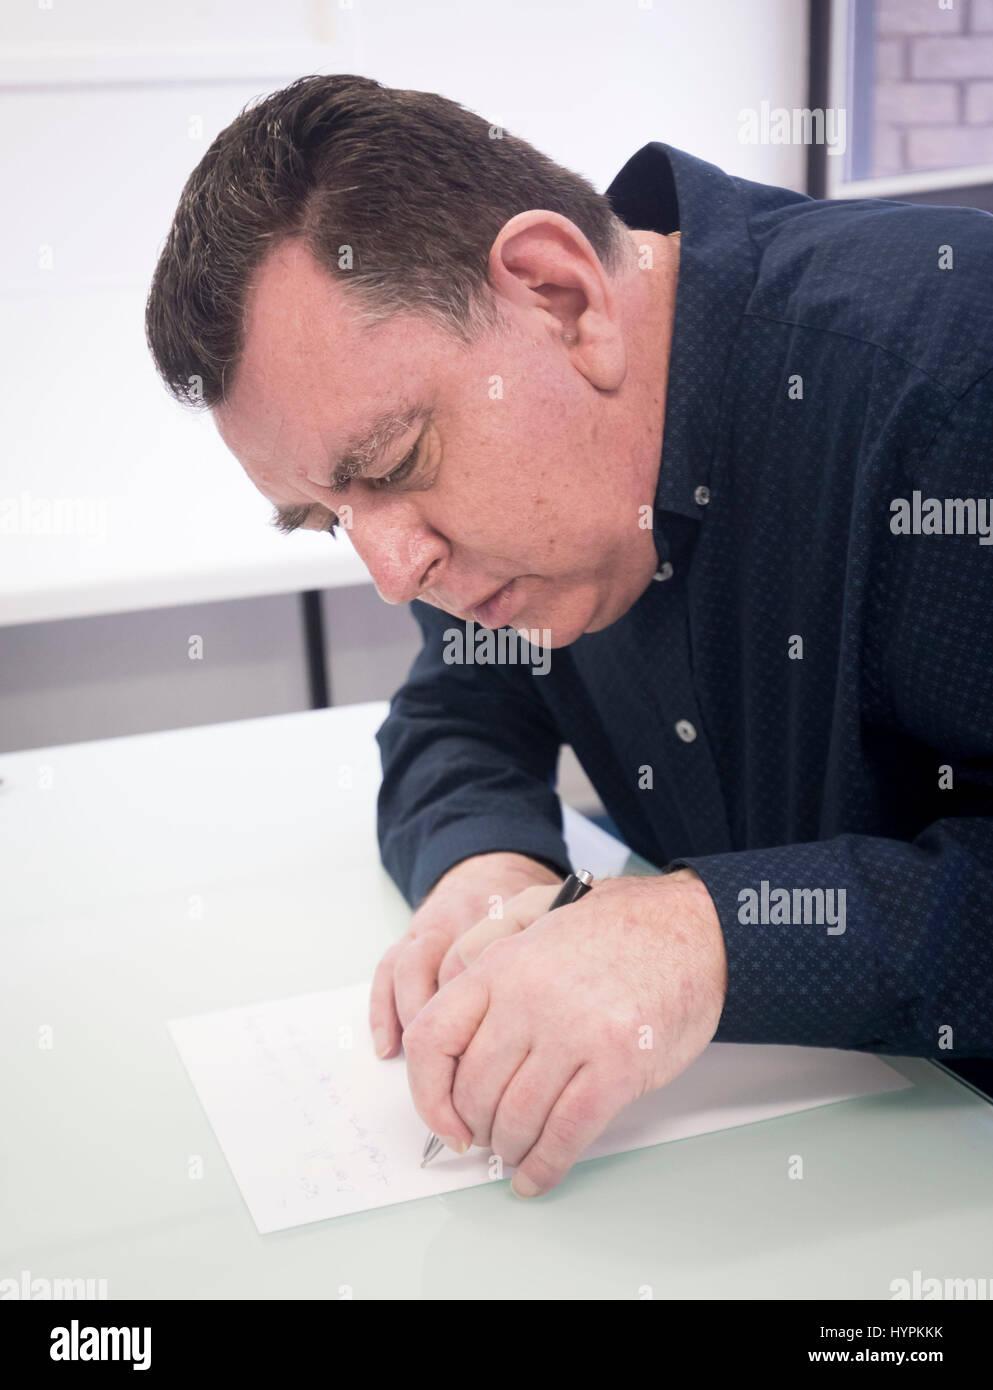 Chris King Imágenes De Stock & Chris King Fotos De Stock - Alamy